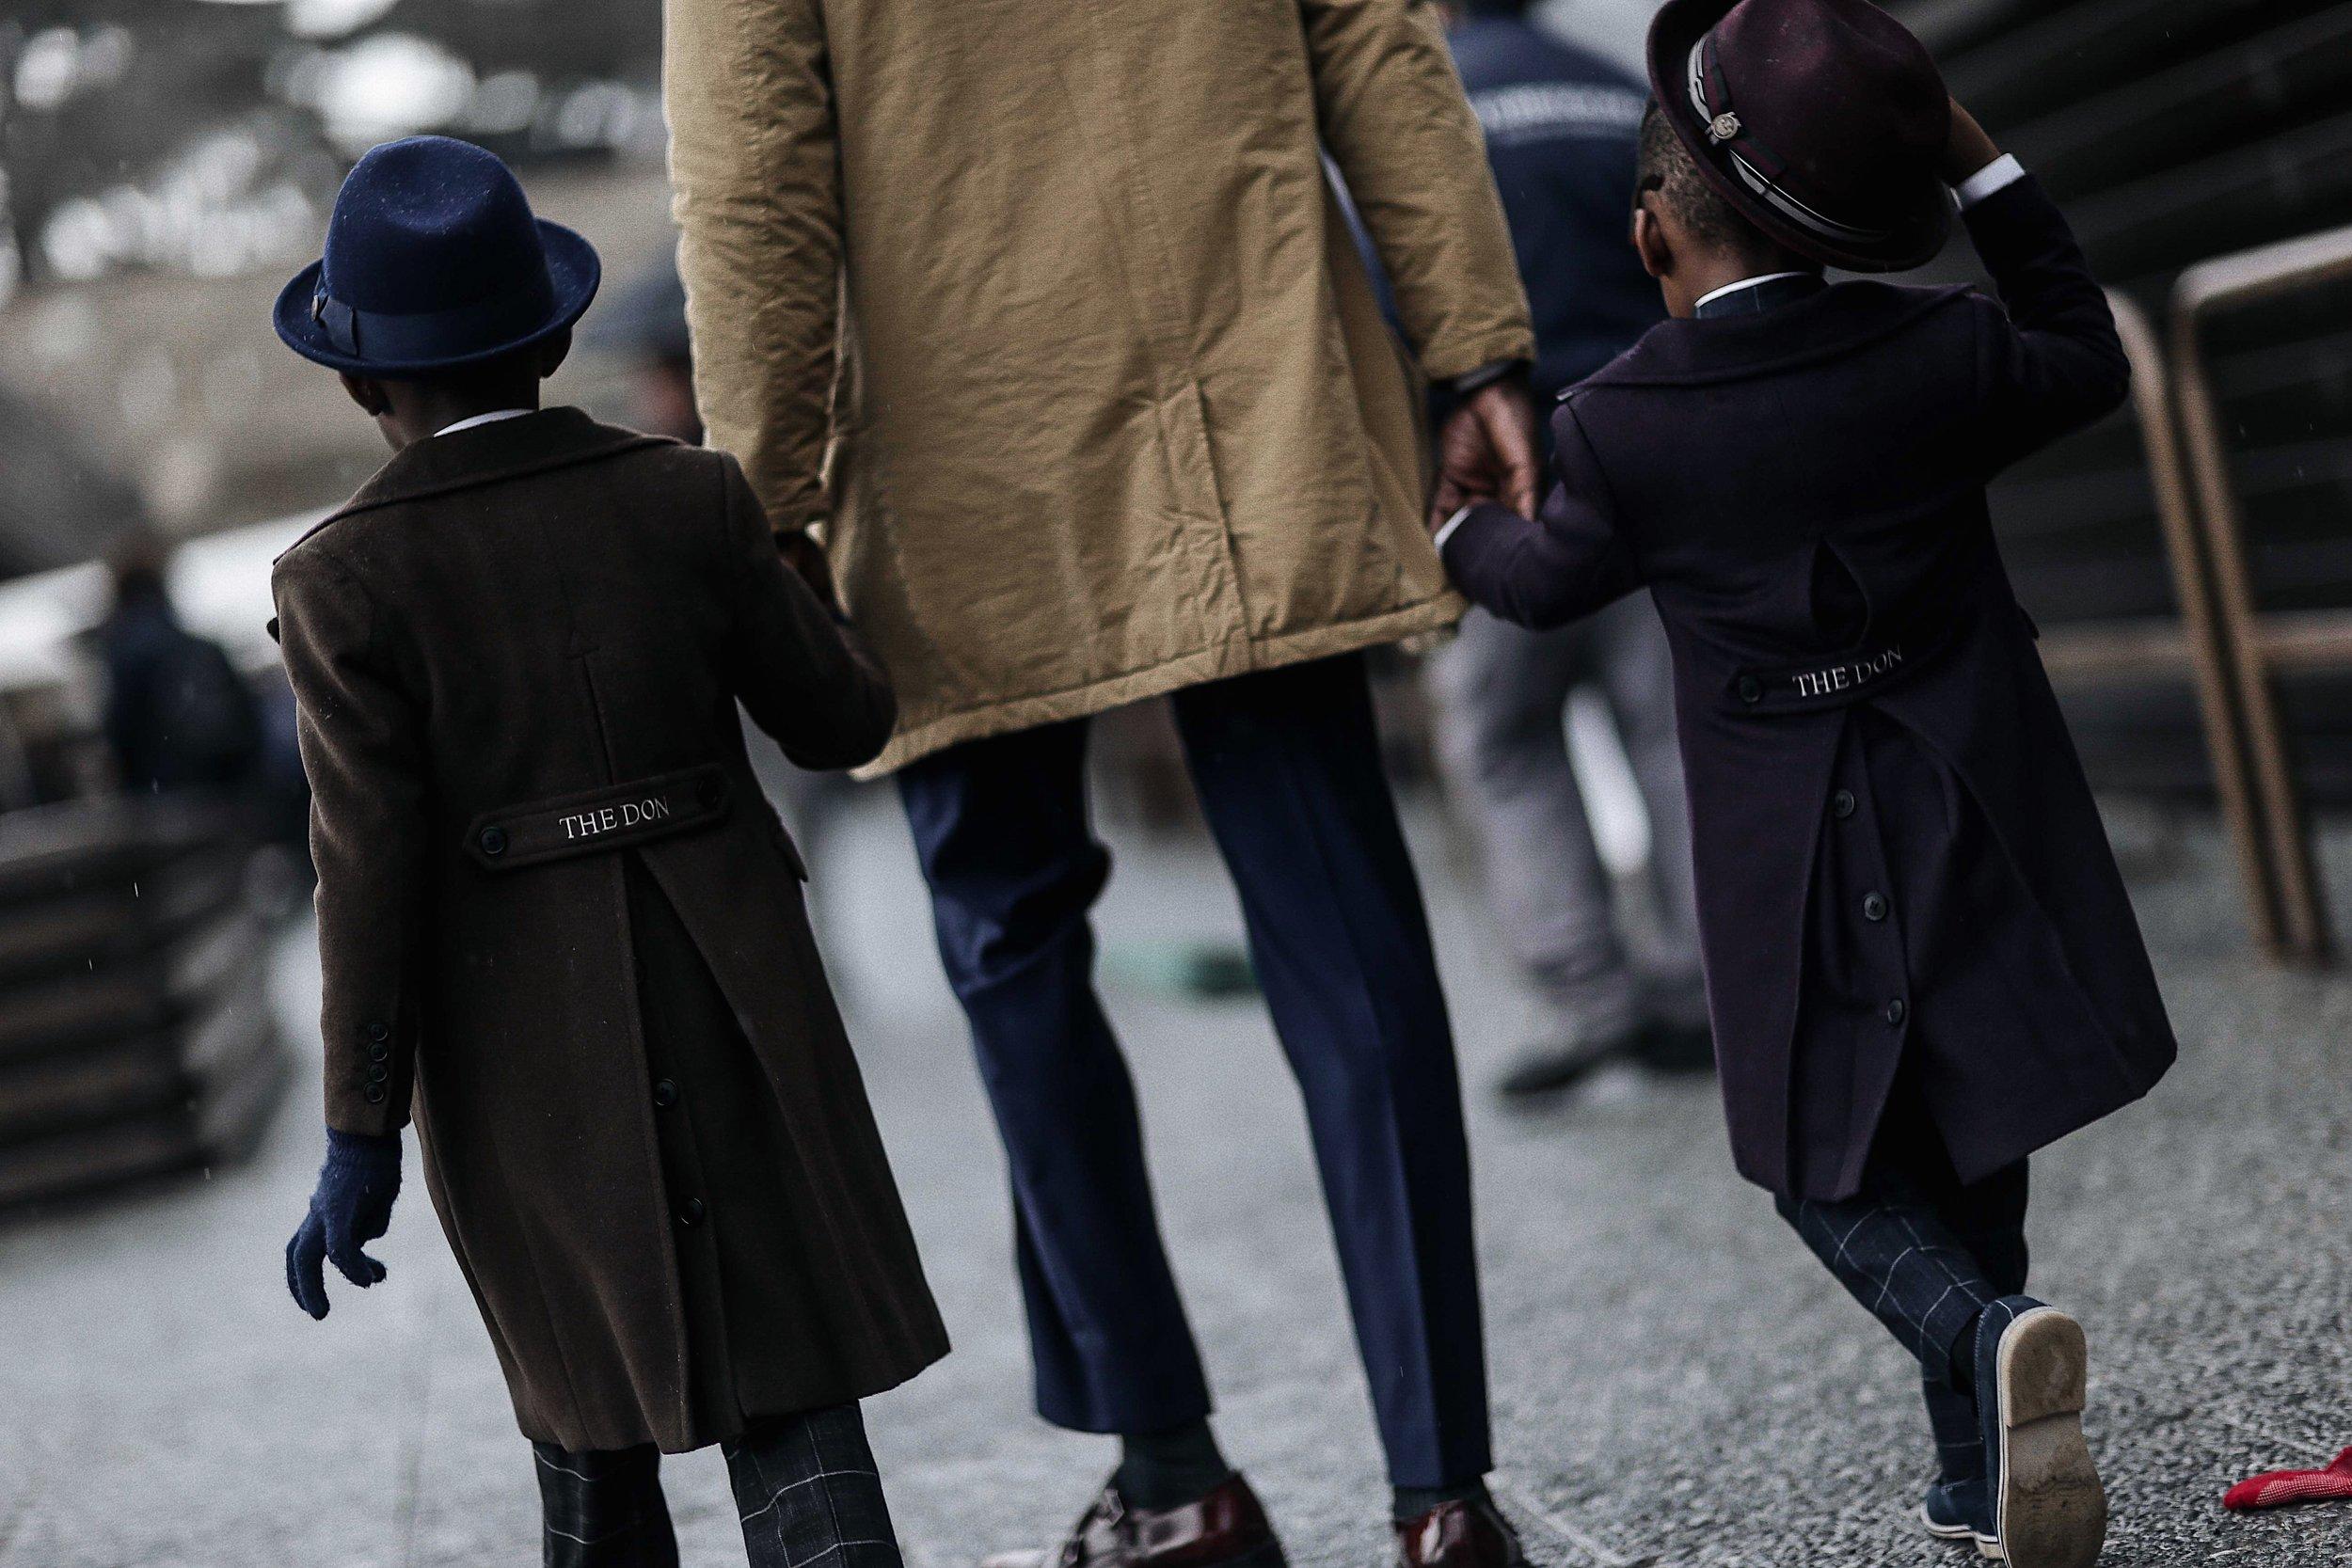 street-style-pitti-uomo-93-constant-evolution-digitalagentur-blog.jpg